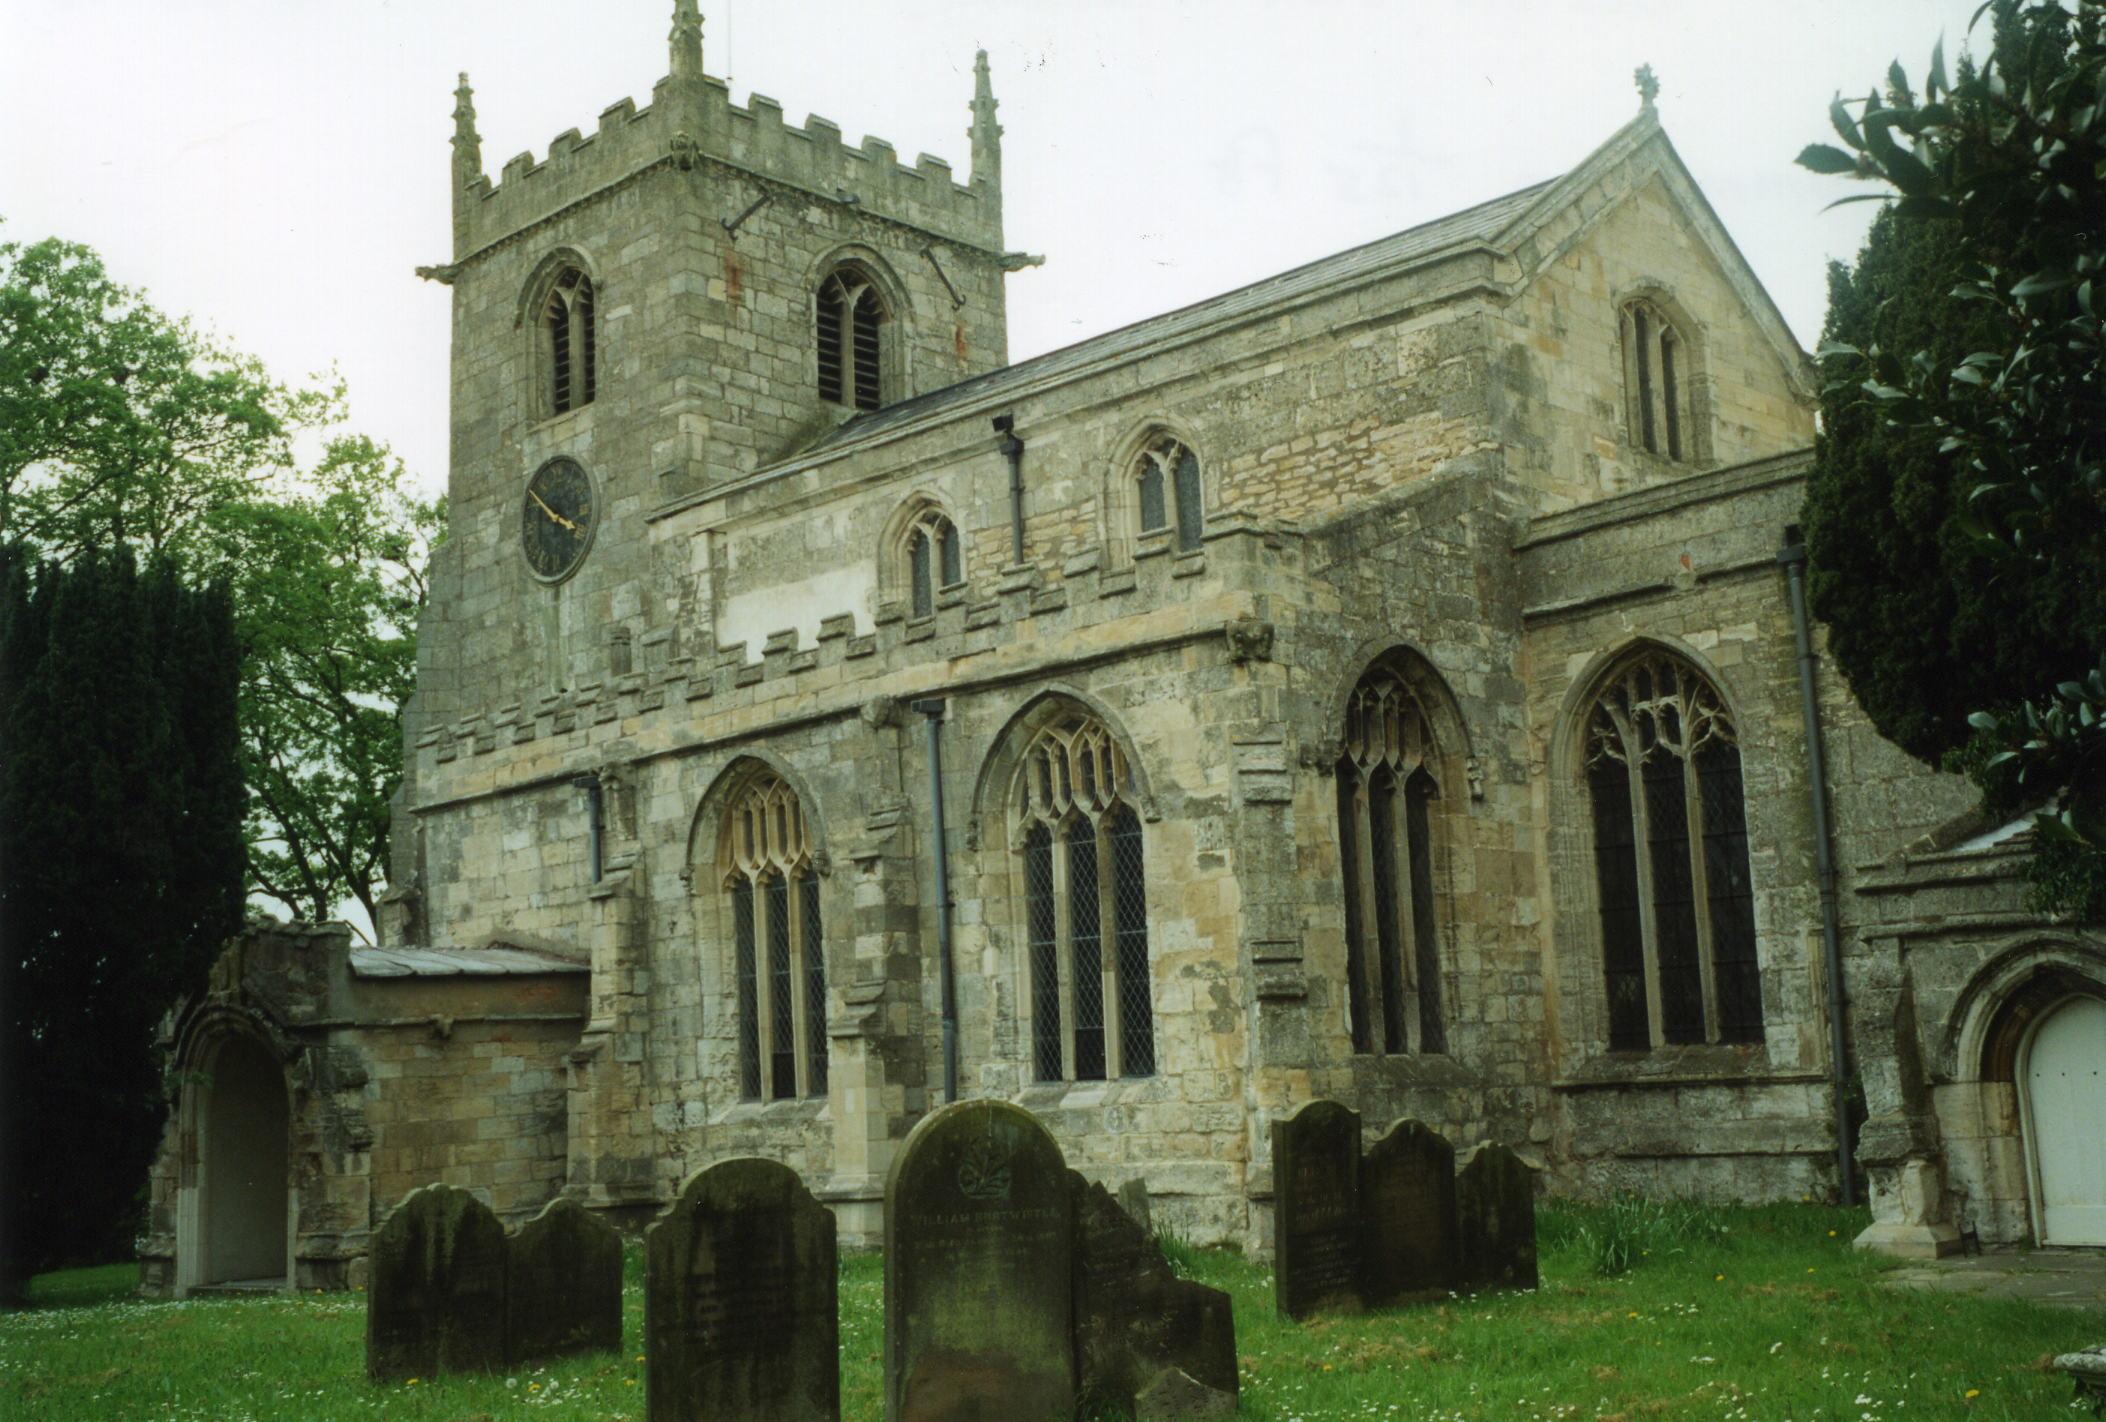 Belton All Saints parish church